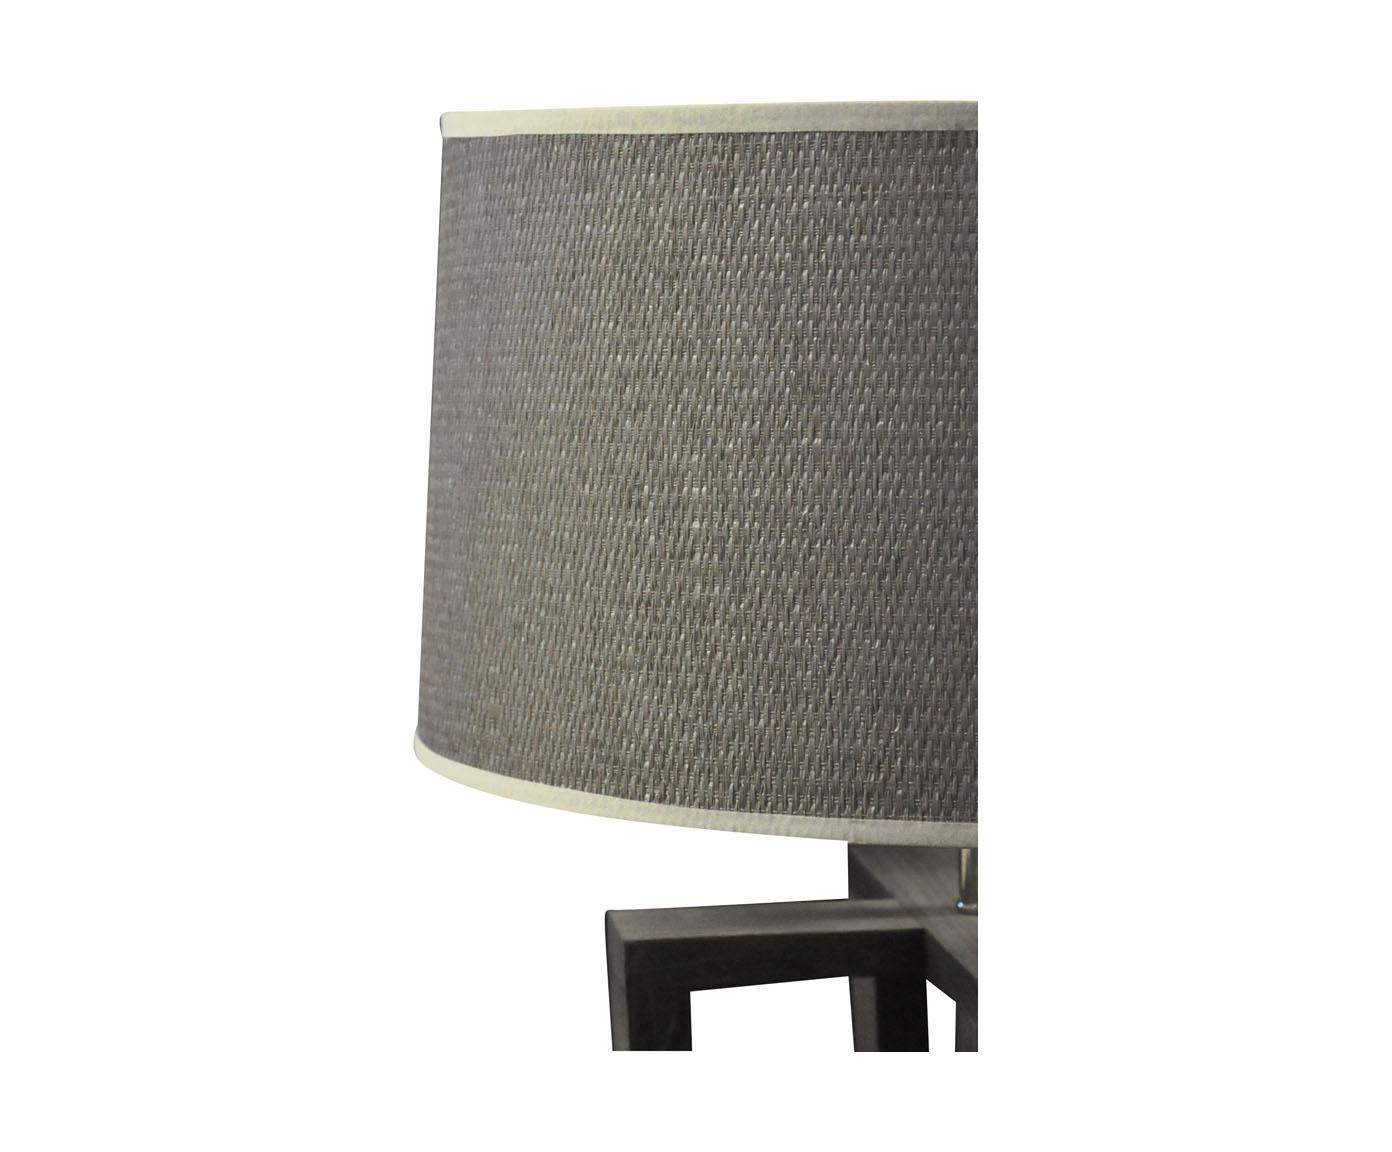 lampe design scandinave quadripode en bois gris demeure. Black Bedroom Furniture Sets. Home Design Ideas